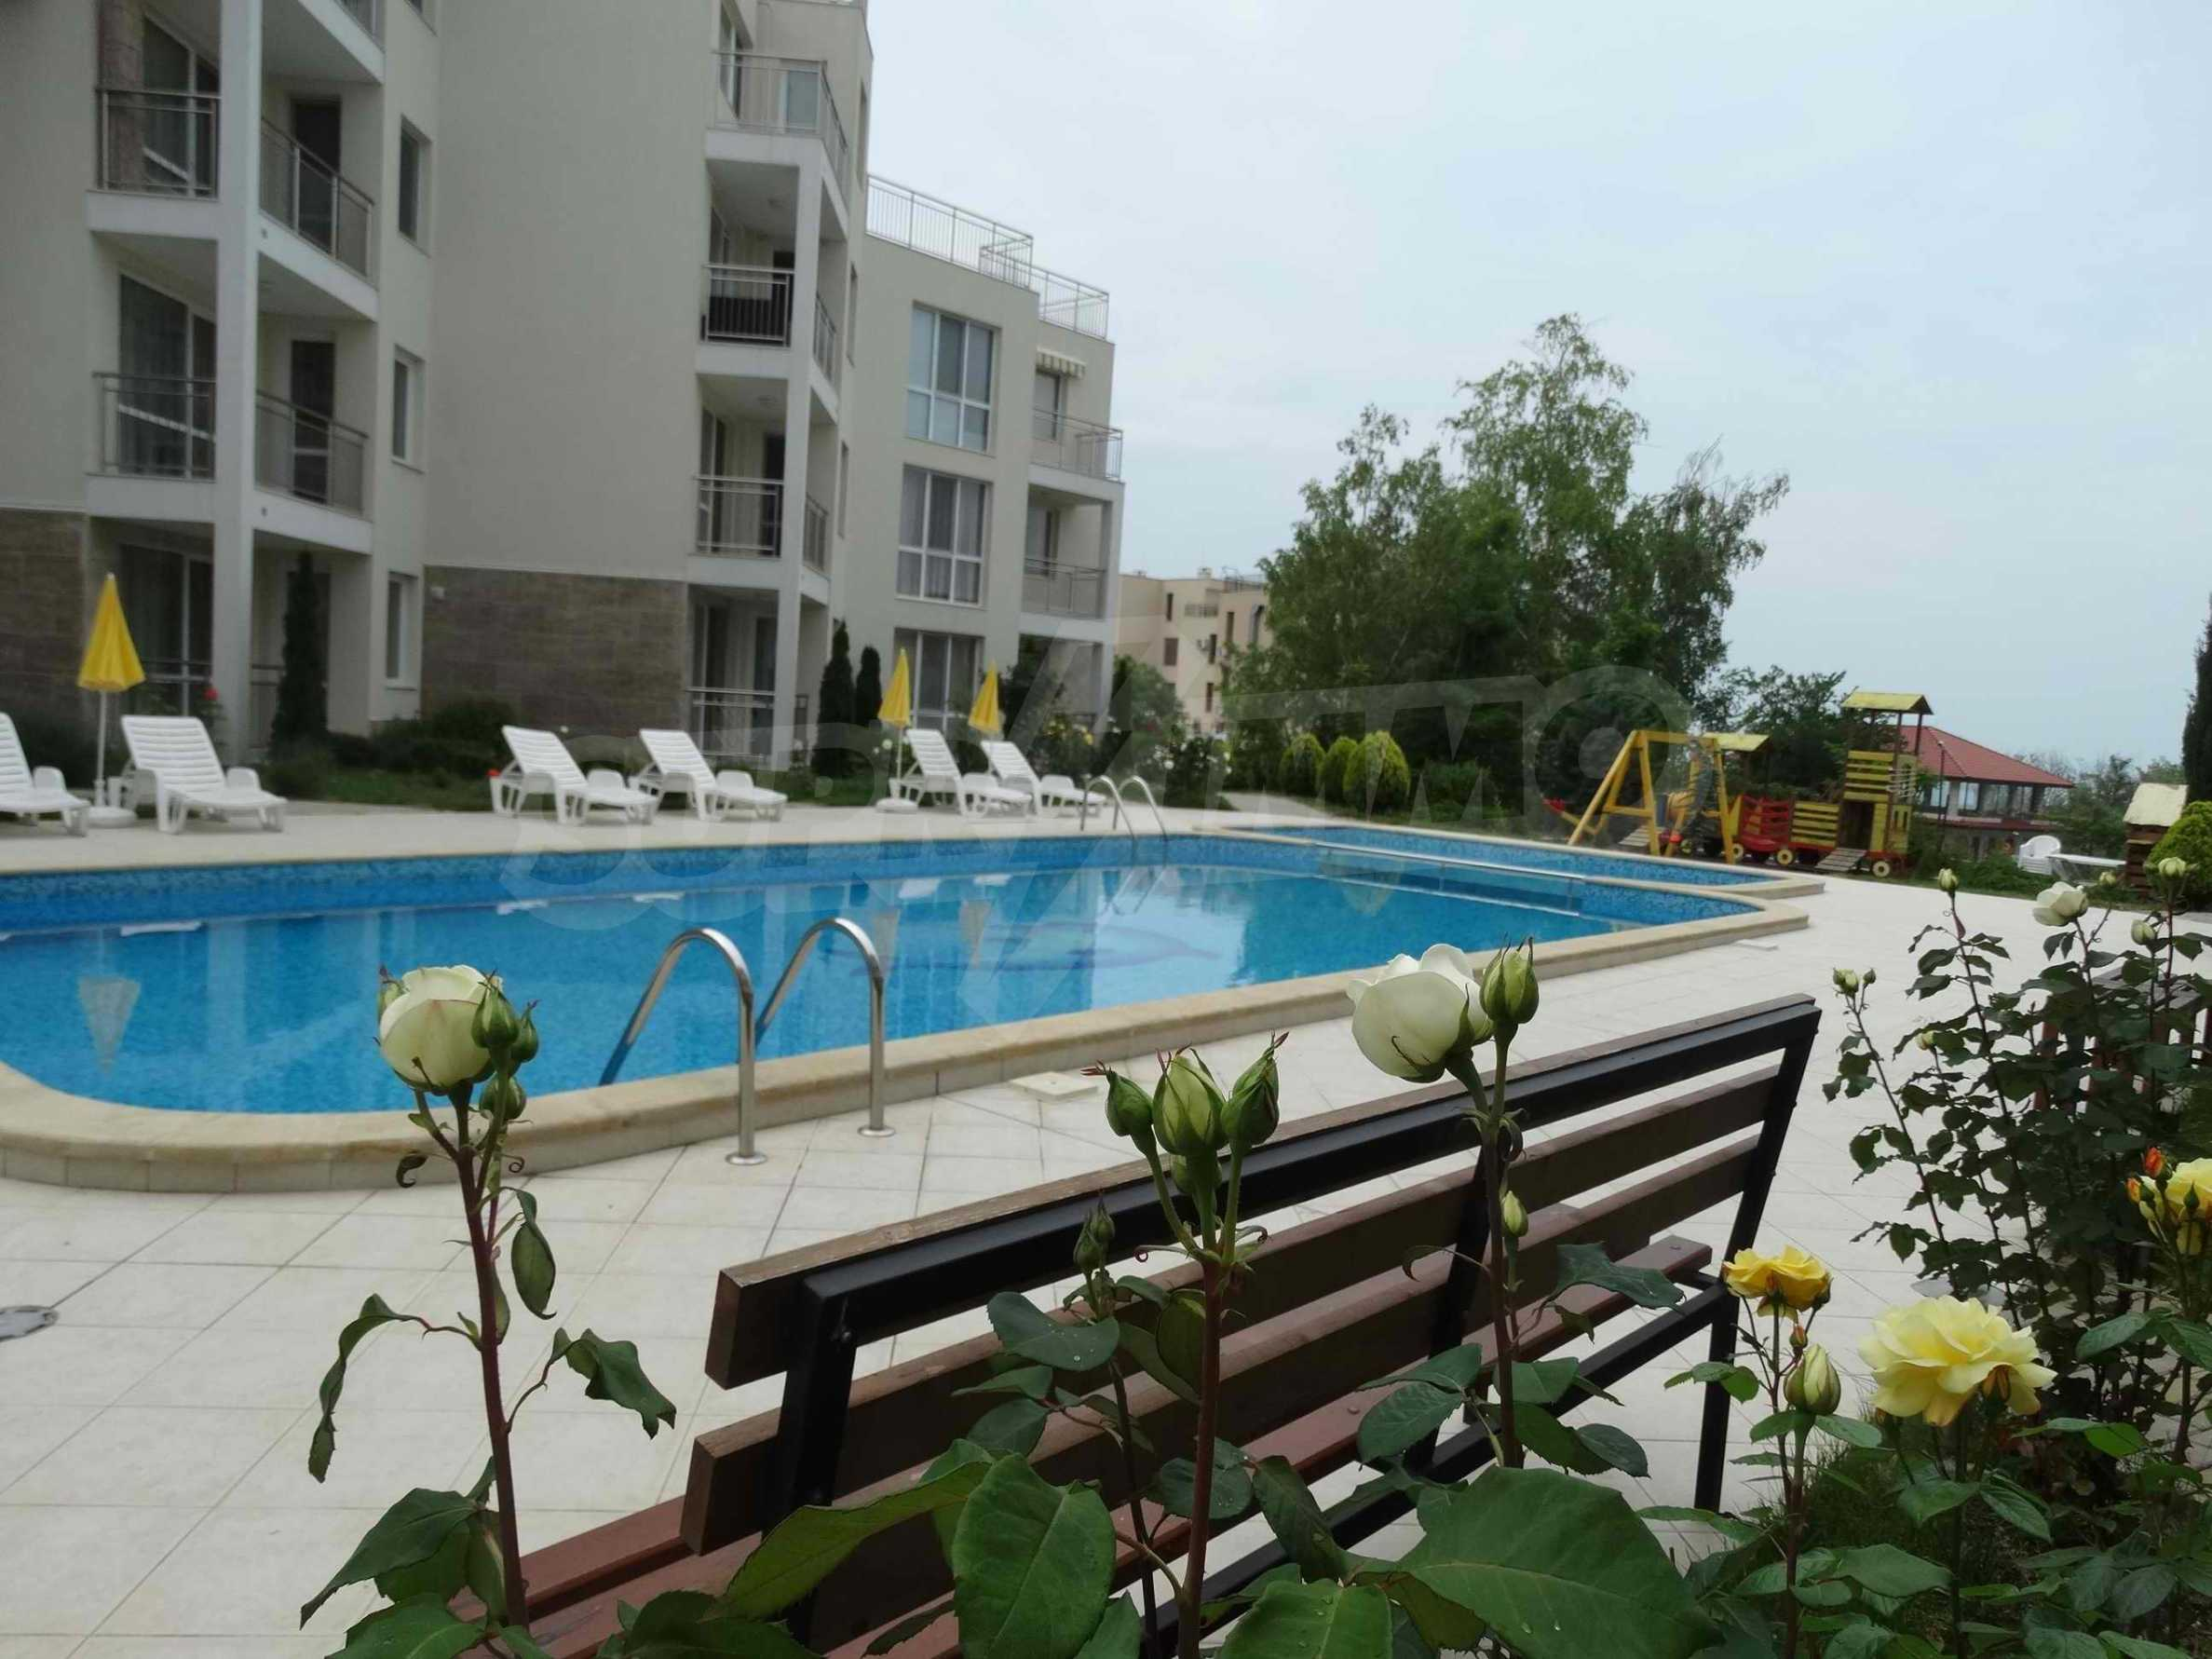 Тристаен апартамент близо до плажа в Бяла